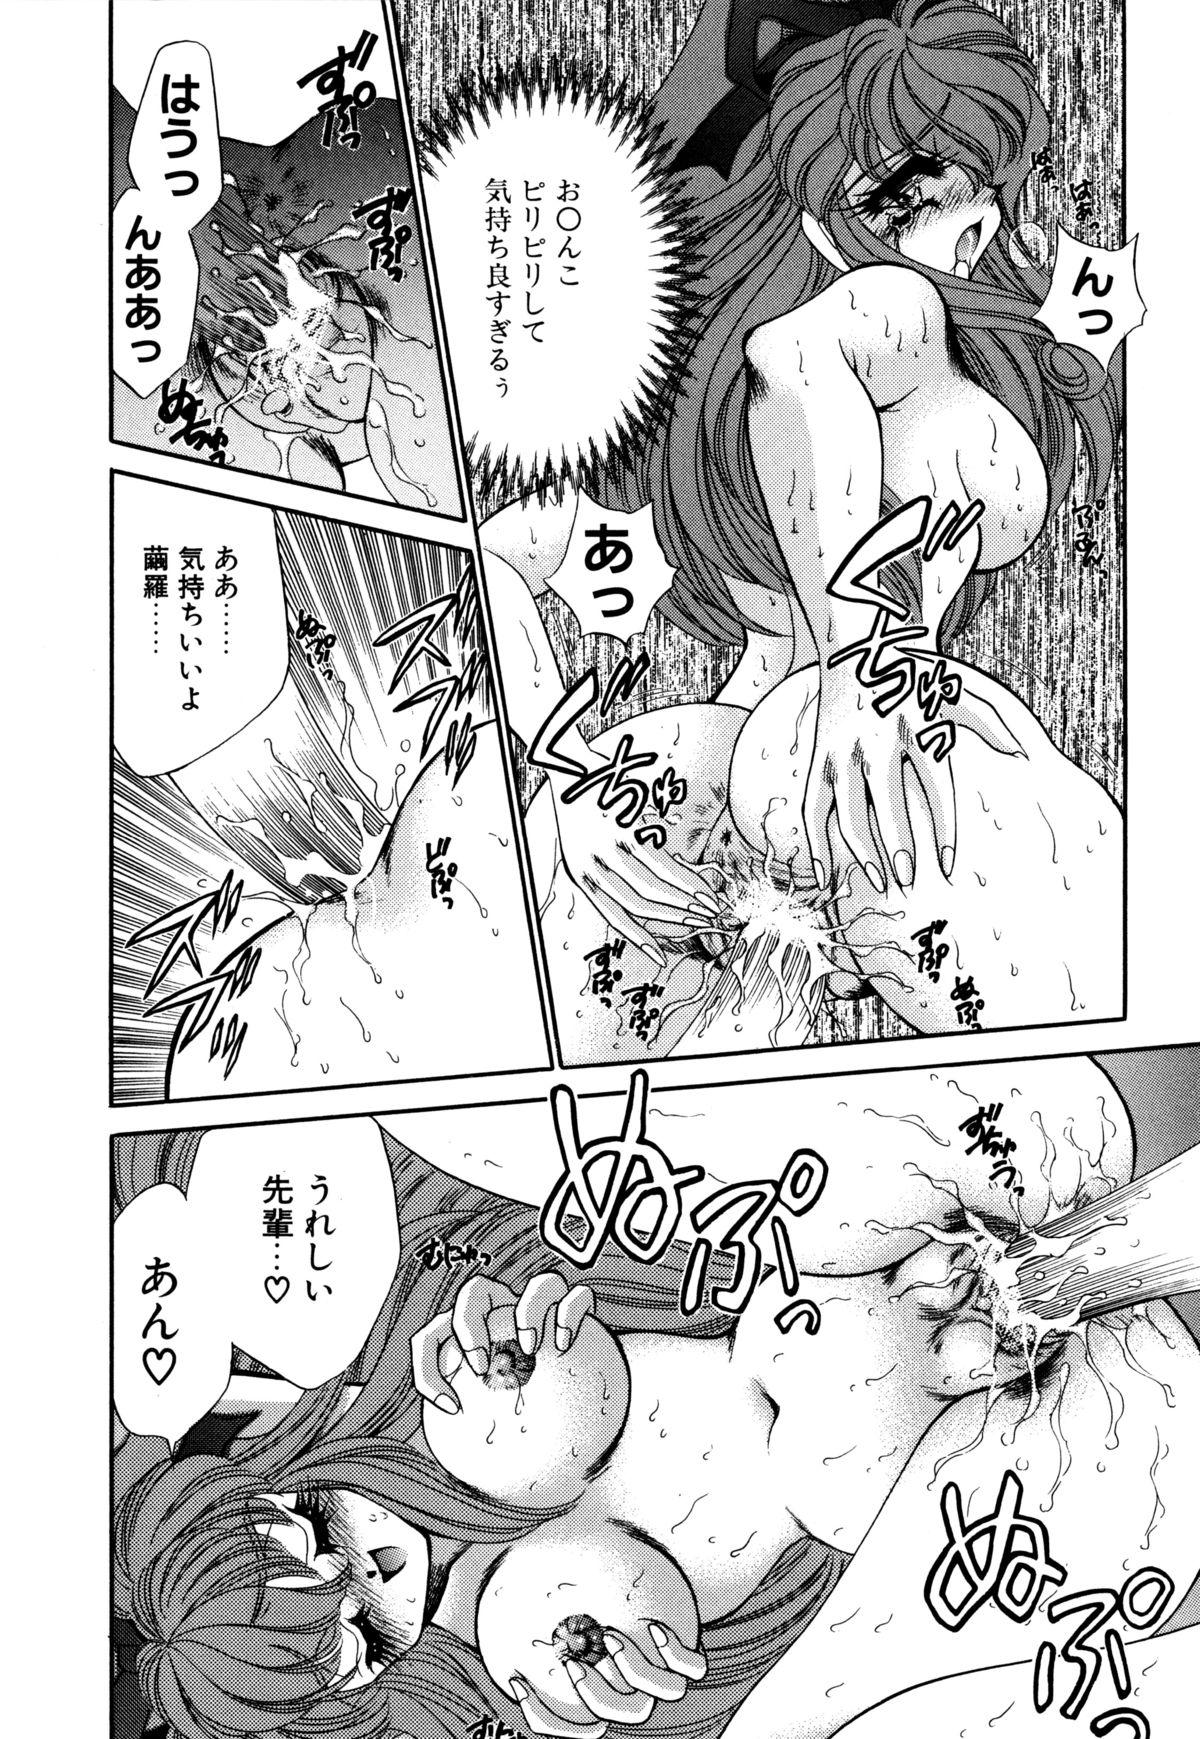 Kigurumi Sentai Quiltian 124